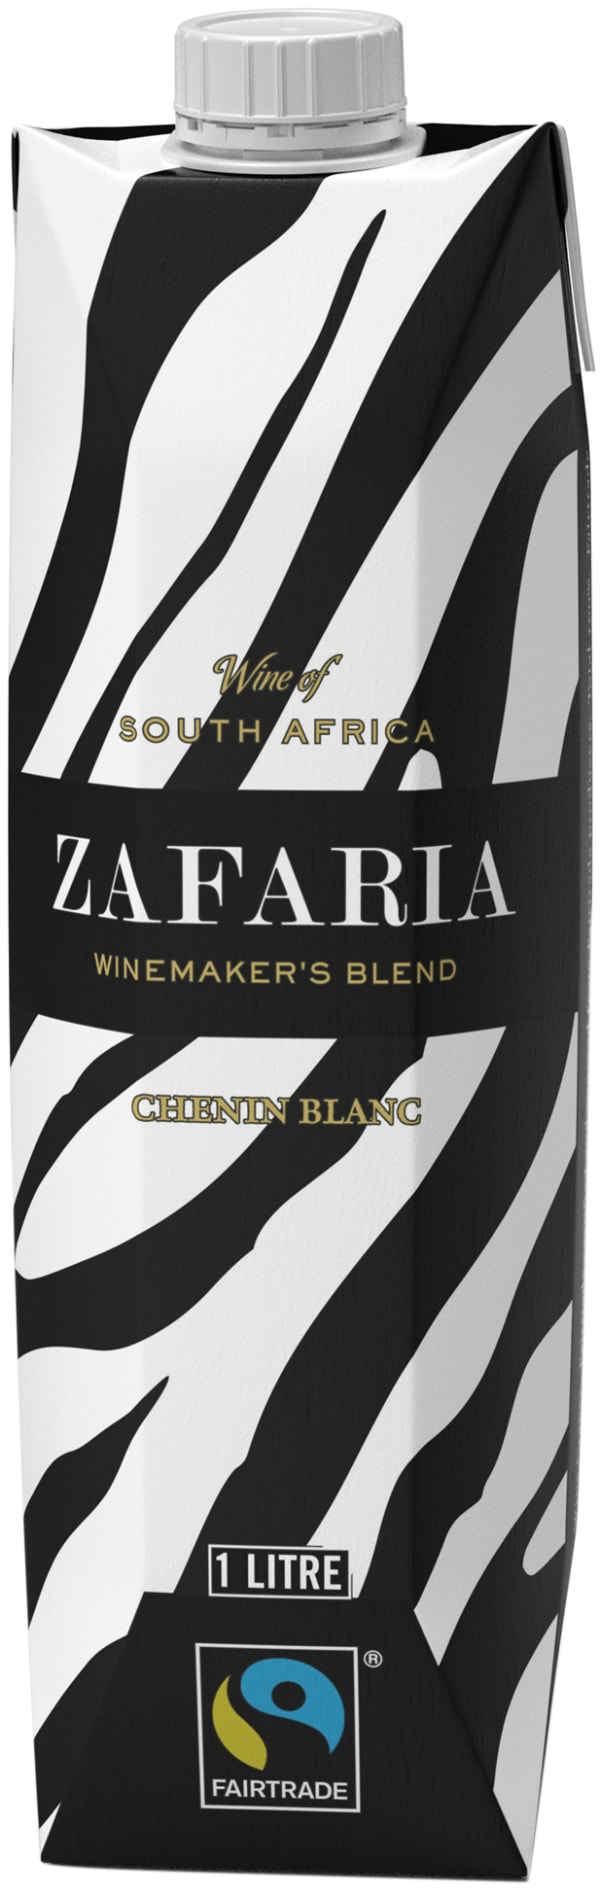 Zafrica Winemakers Blend Chenin Blanc 2016 carton package